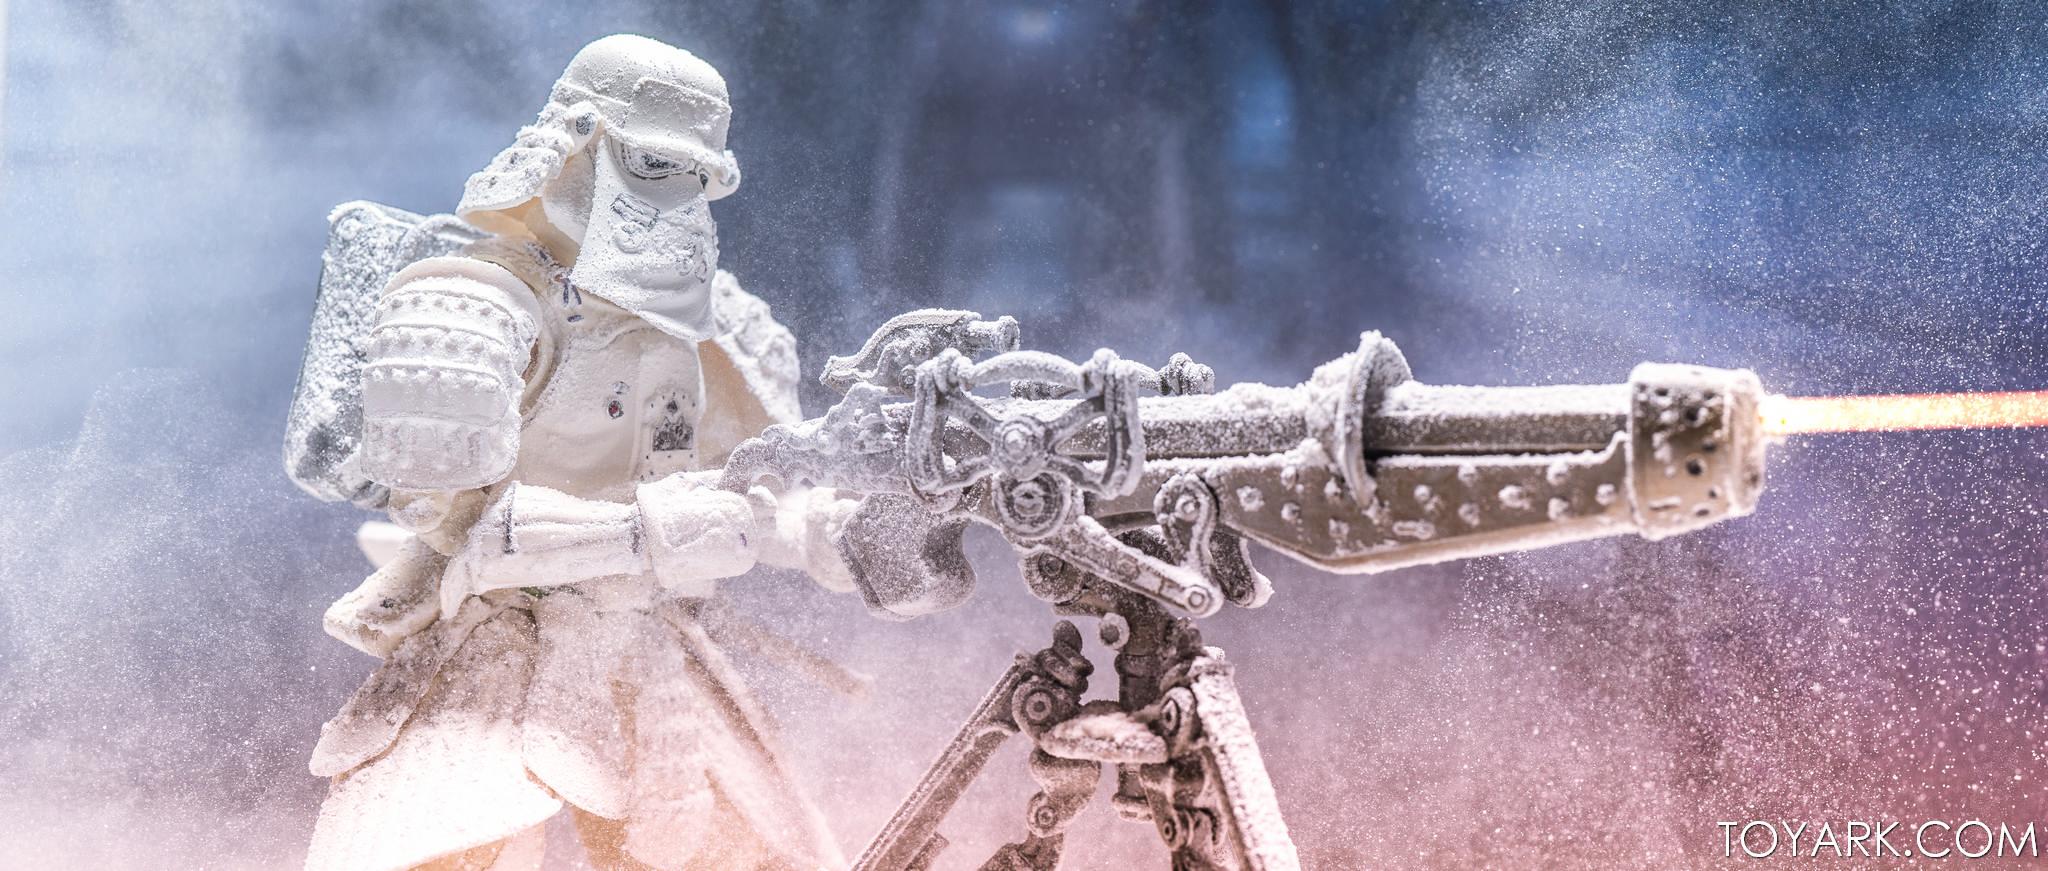 STAR WARS Movie Realization - KANREICHI ASHIGARU SNOWTROOPER Realization-Snowtrooper-45